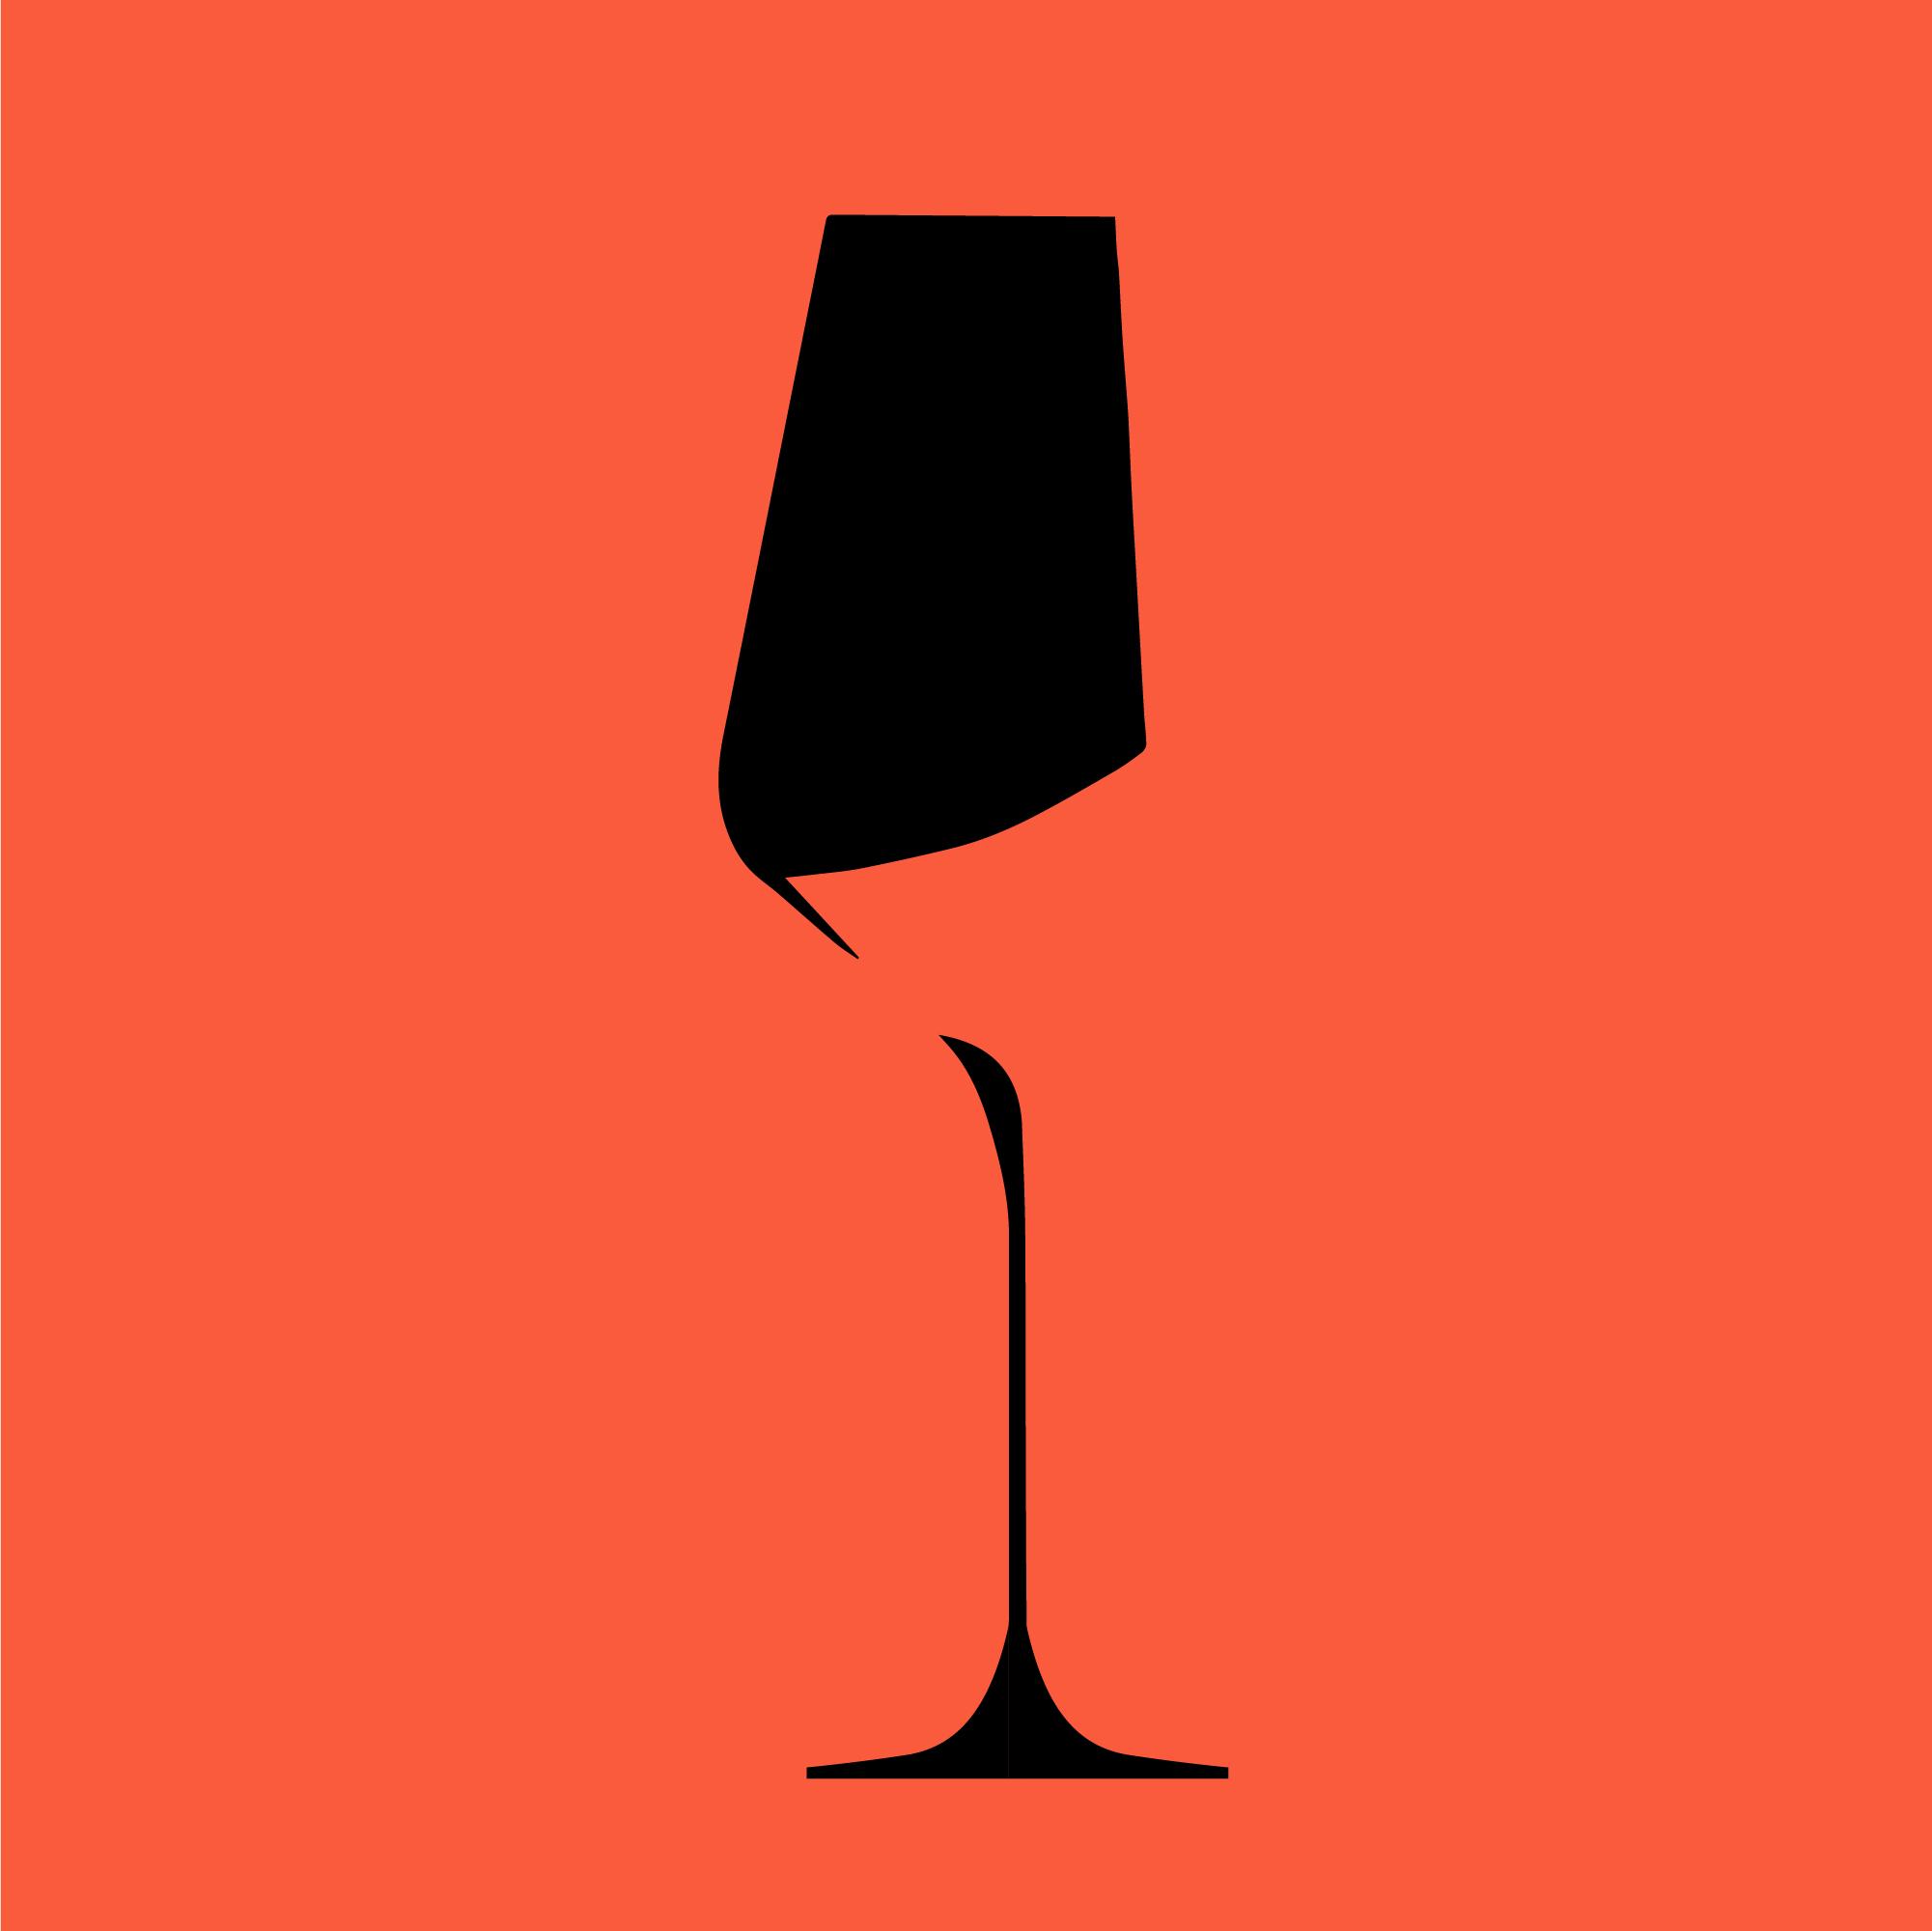 Wine glass-01.jpg